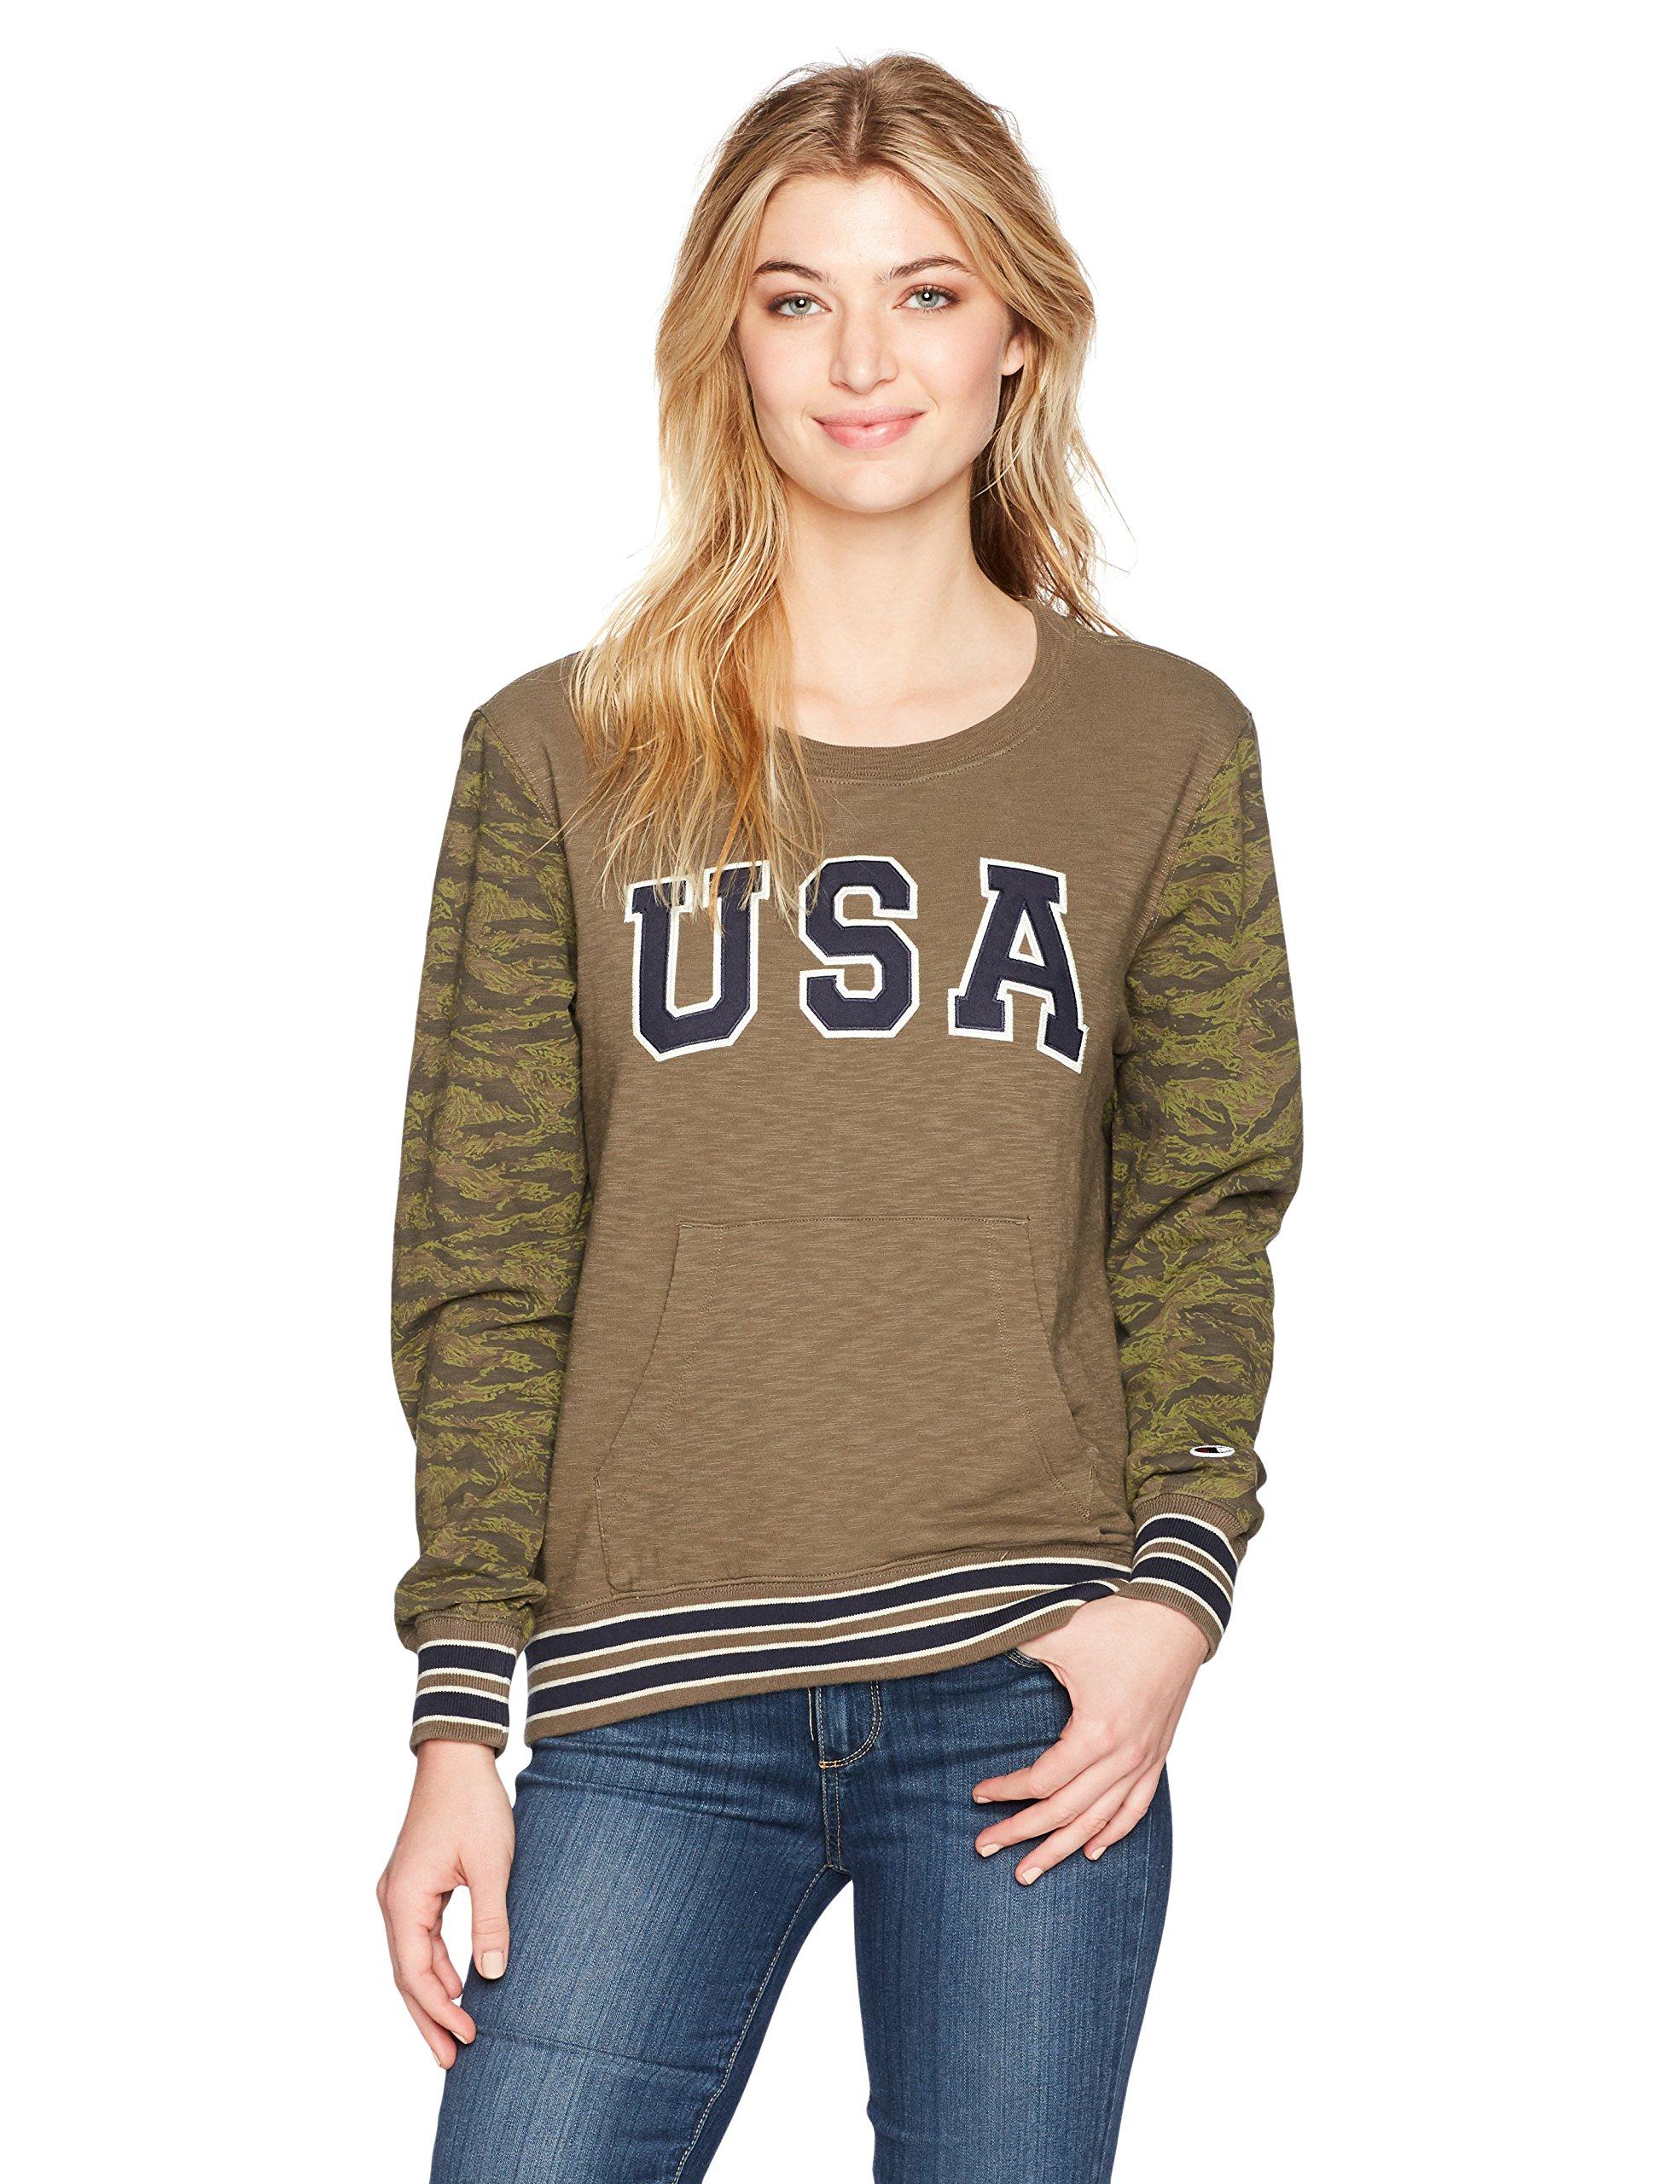 Champion Women's French Terry Sweatshirt (Edition), Green Camo, XXL